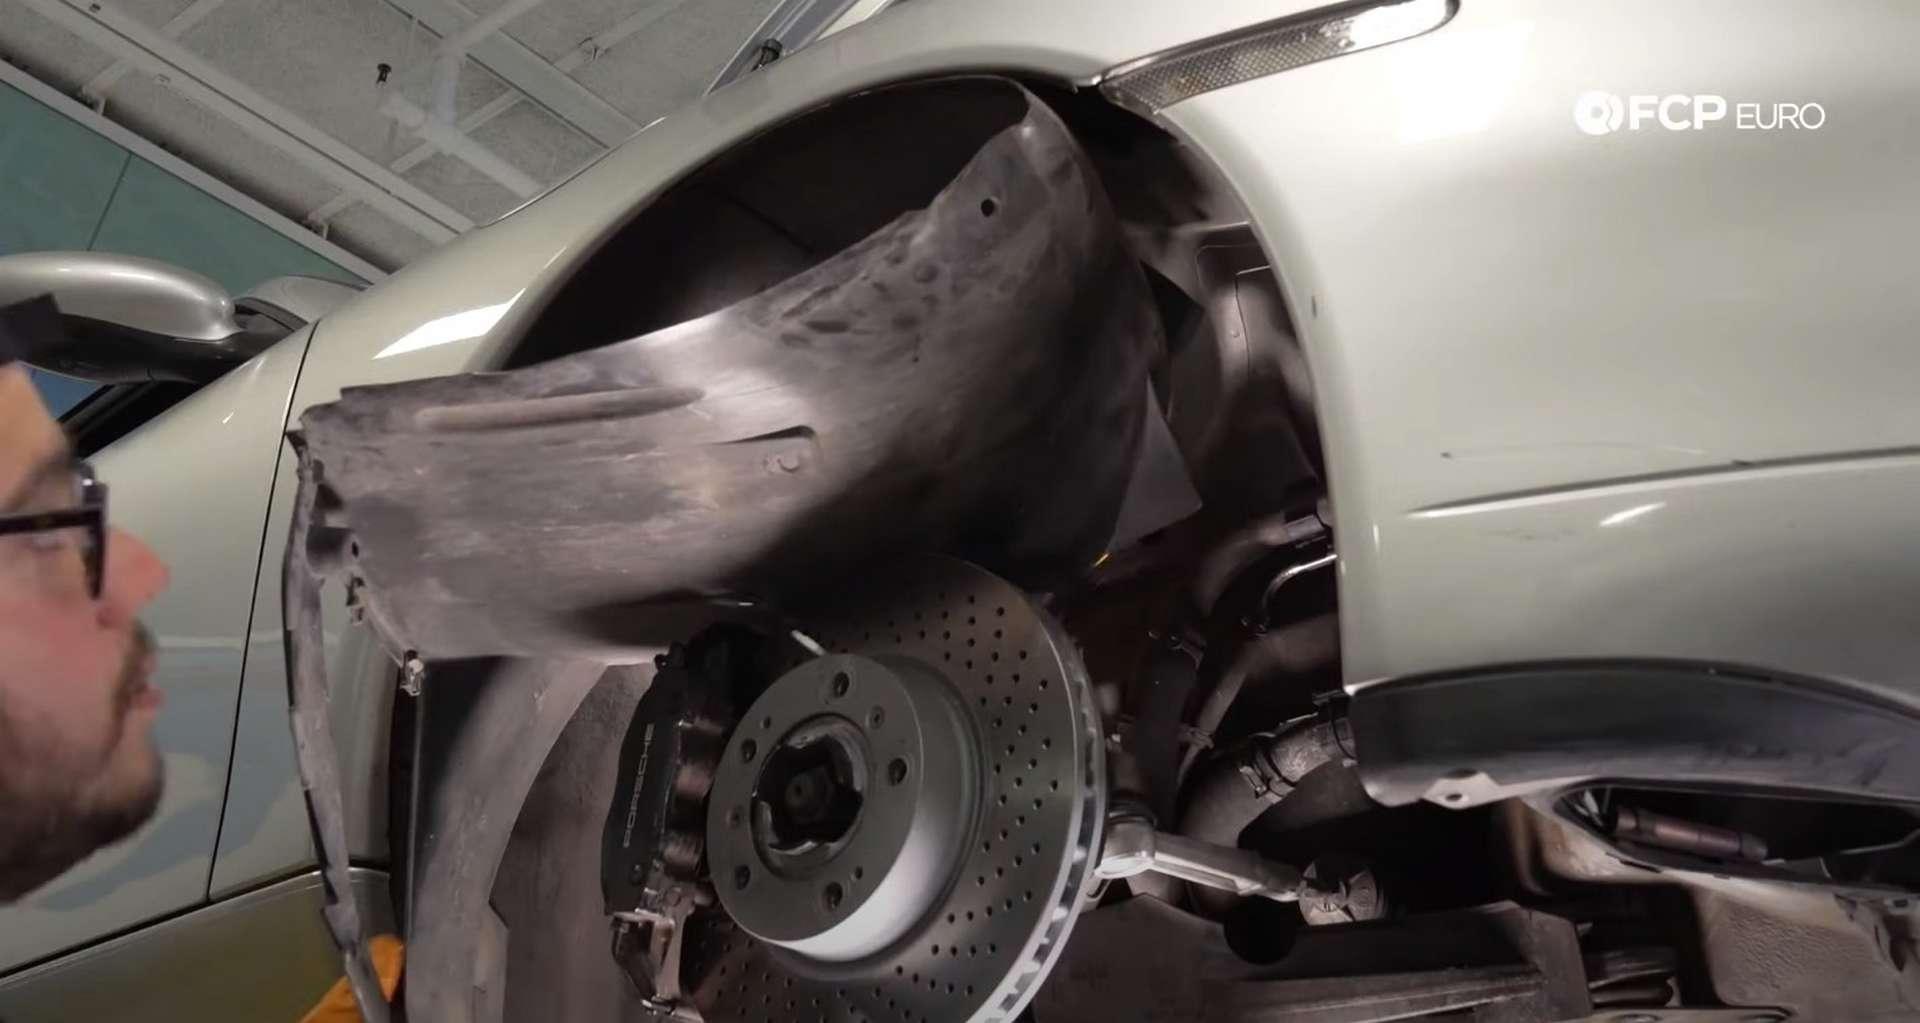 DIY Porsche 996 Radiator Replacement tucking the fender liner back